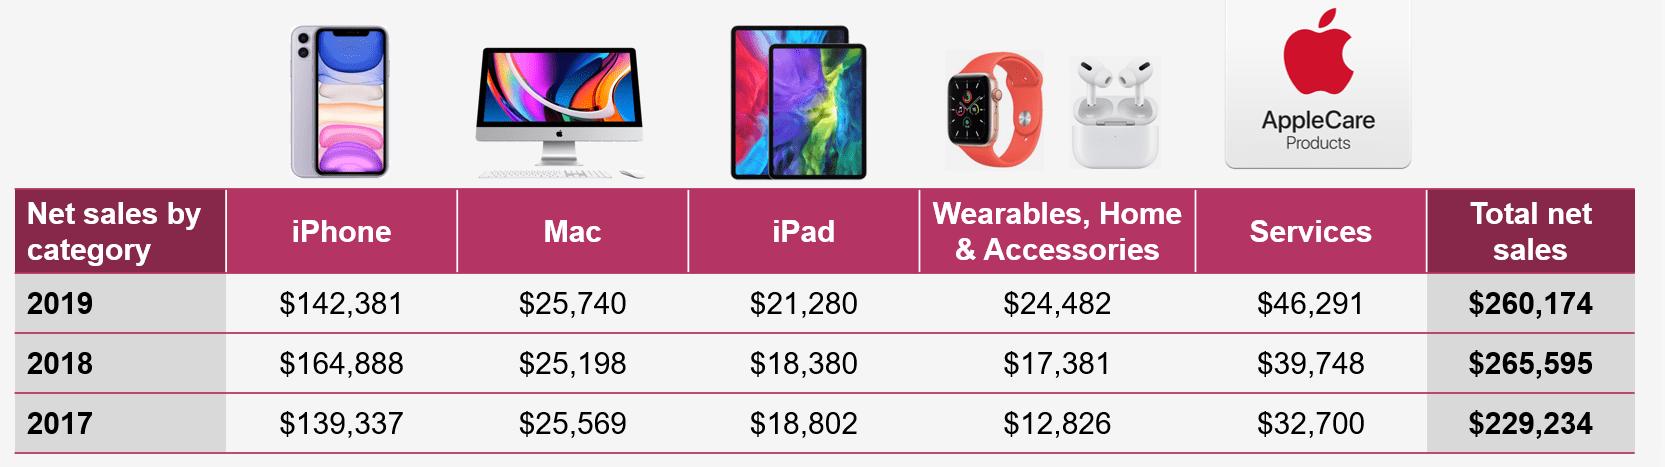 Apple - Annual Report